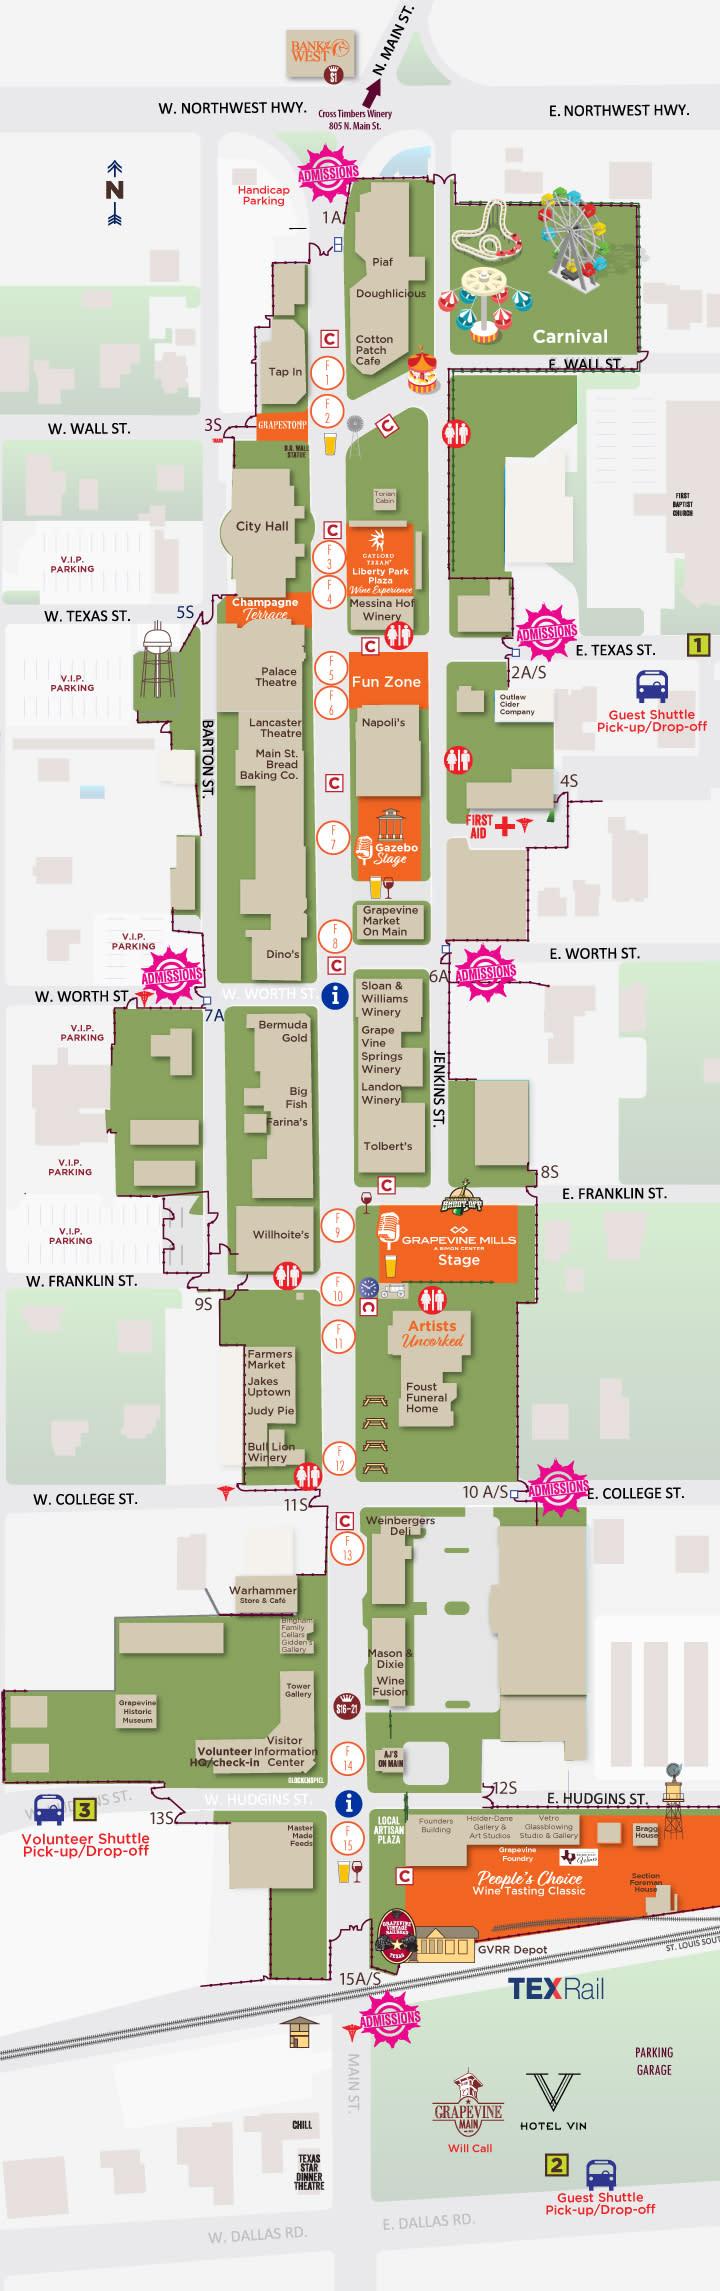 GF21 Festival Map